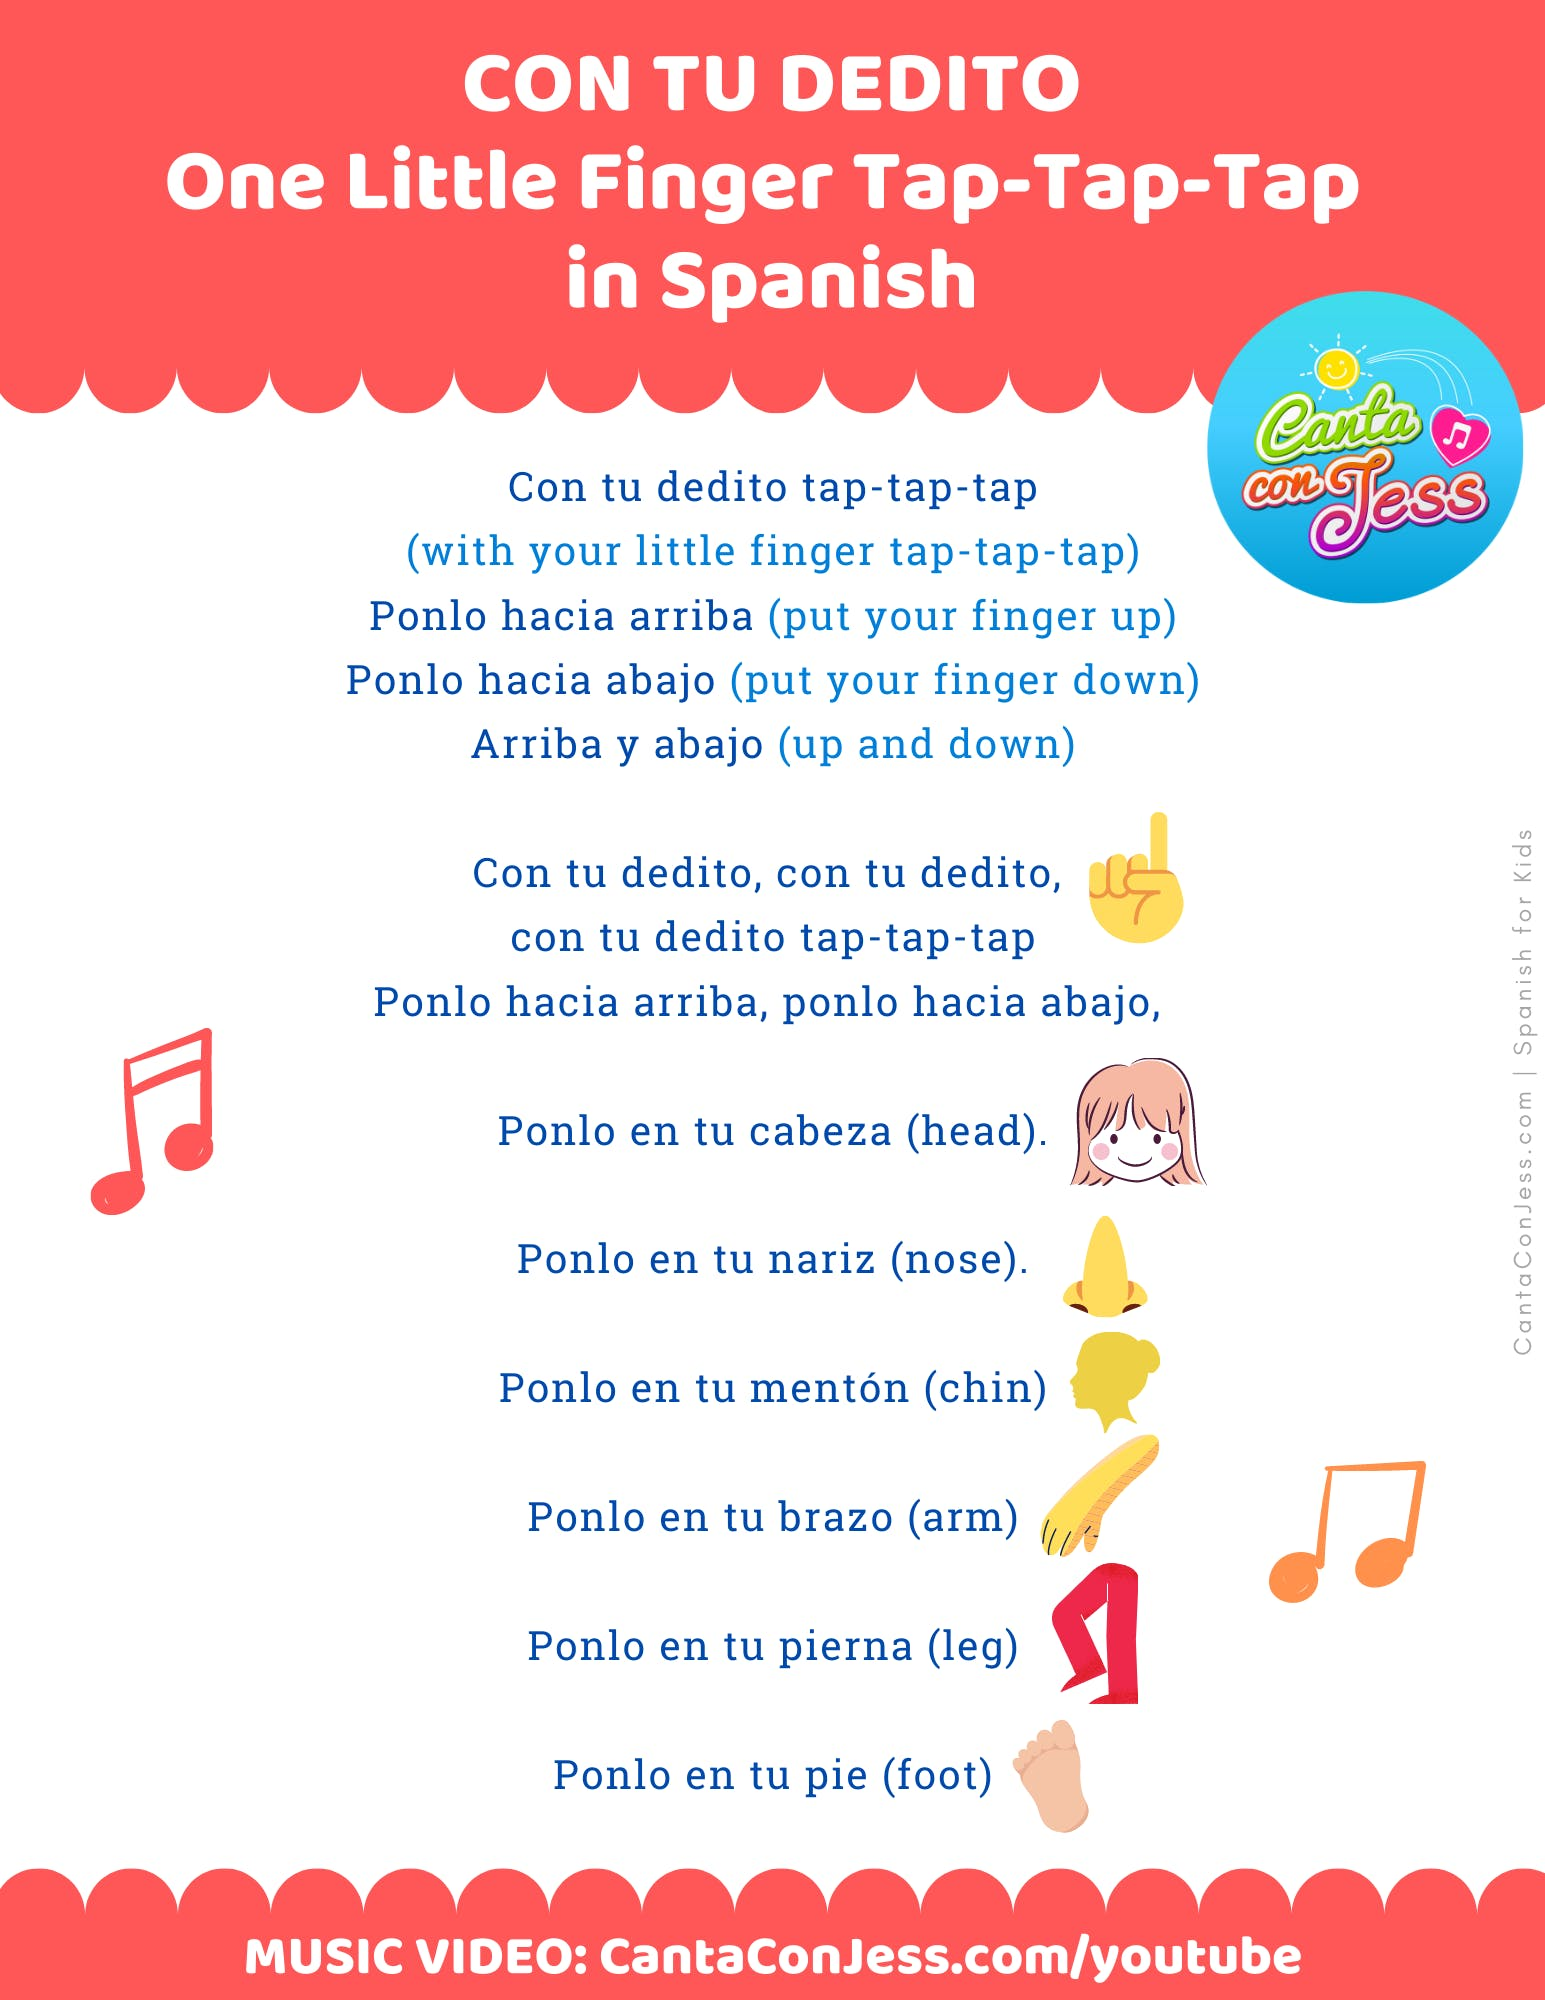 Con Tu Dedito - One Little Finger Tap-Tap-Tap in Spanish LYRICS